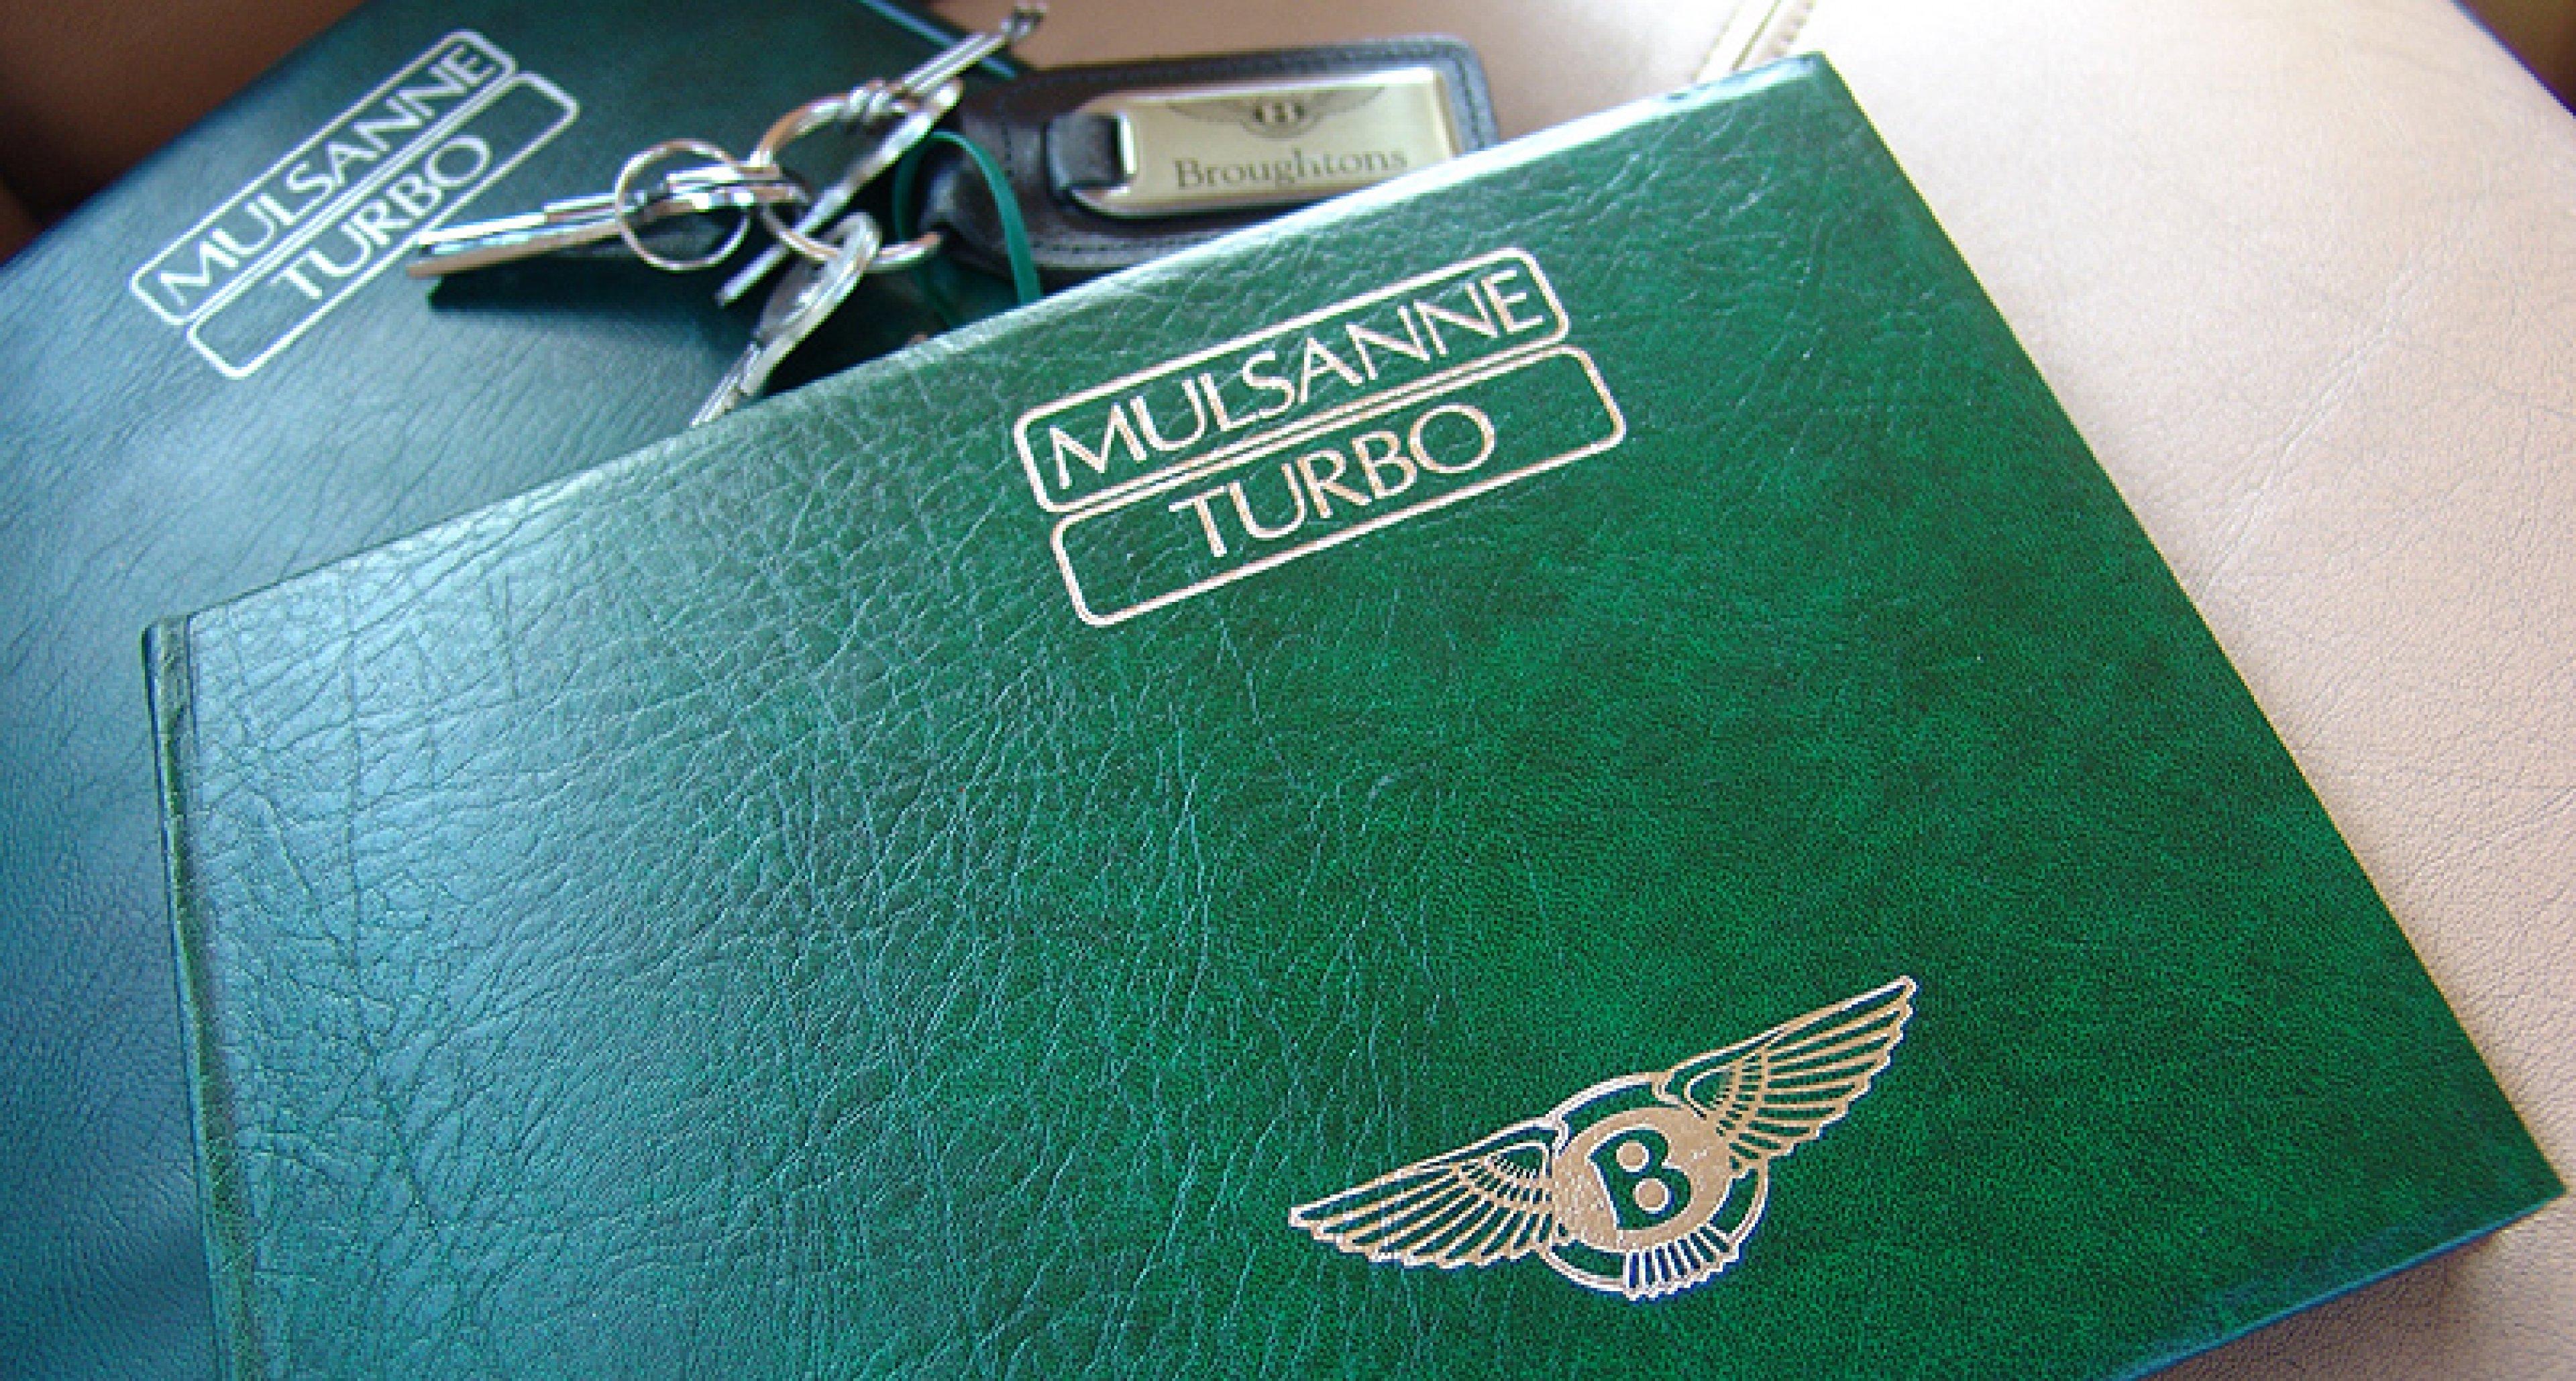 Bentley Mulsanne Turbo